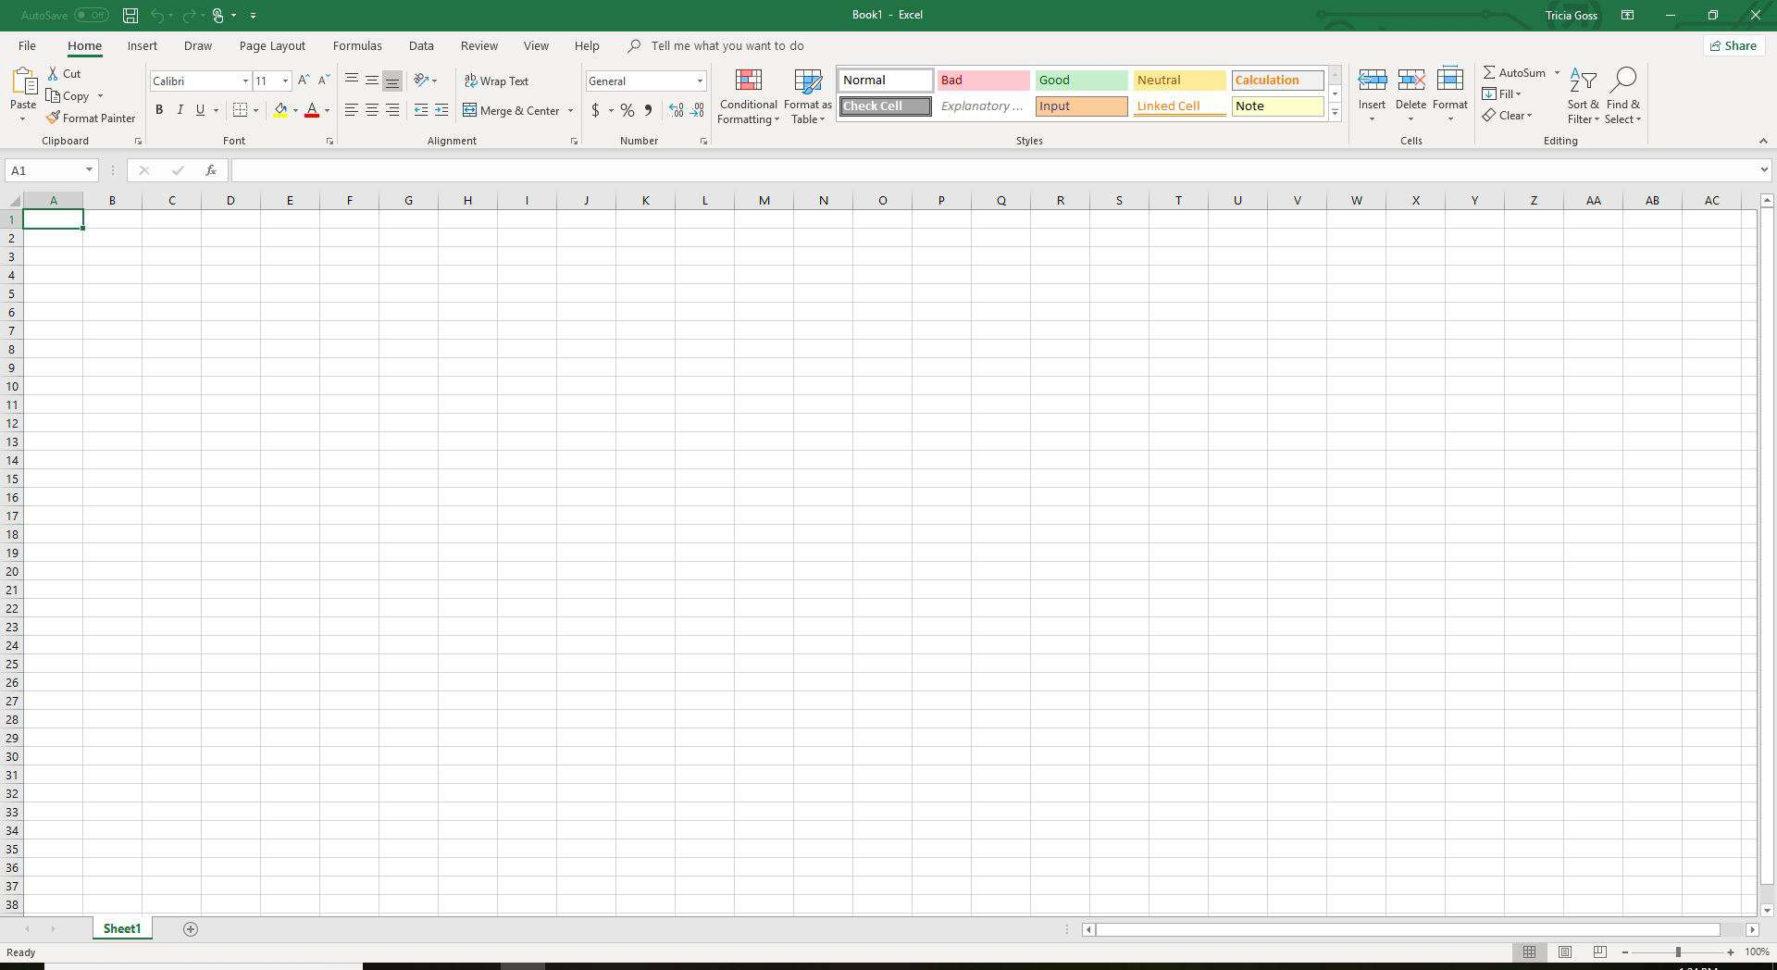 Xl Spreadsheet Tutorial Regarding Excel Tutorials For Beginners